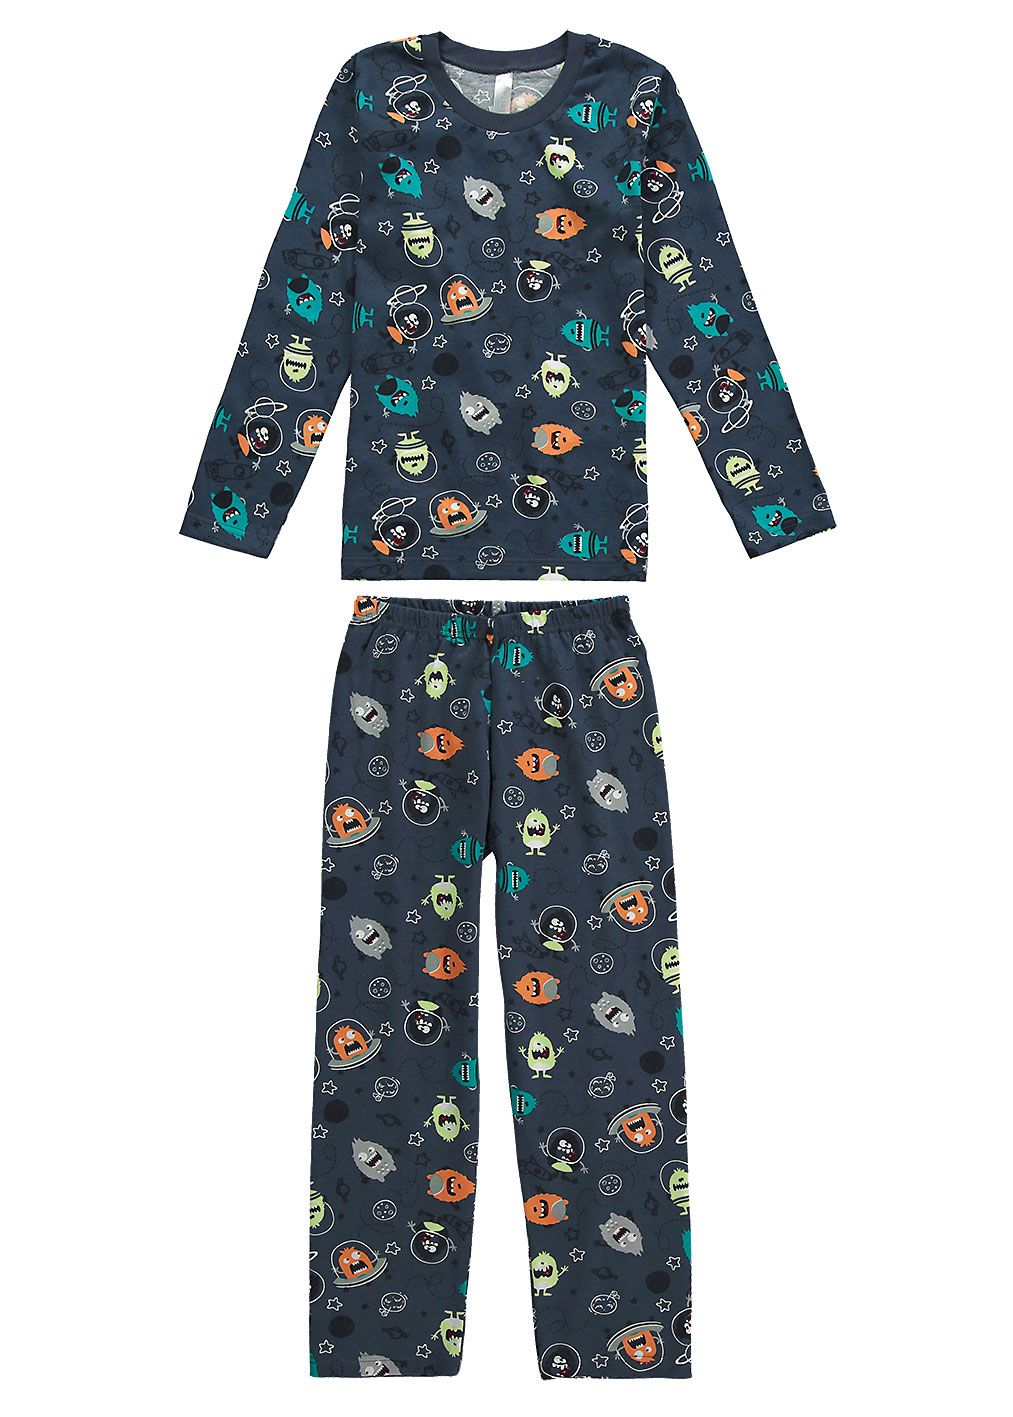 Pijama Infantil Masculino Inverno Azul Monstrinho Malwee